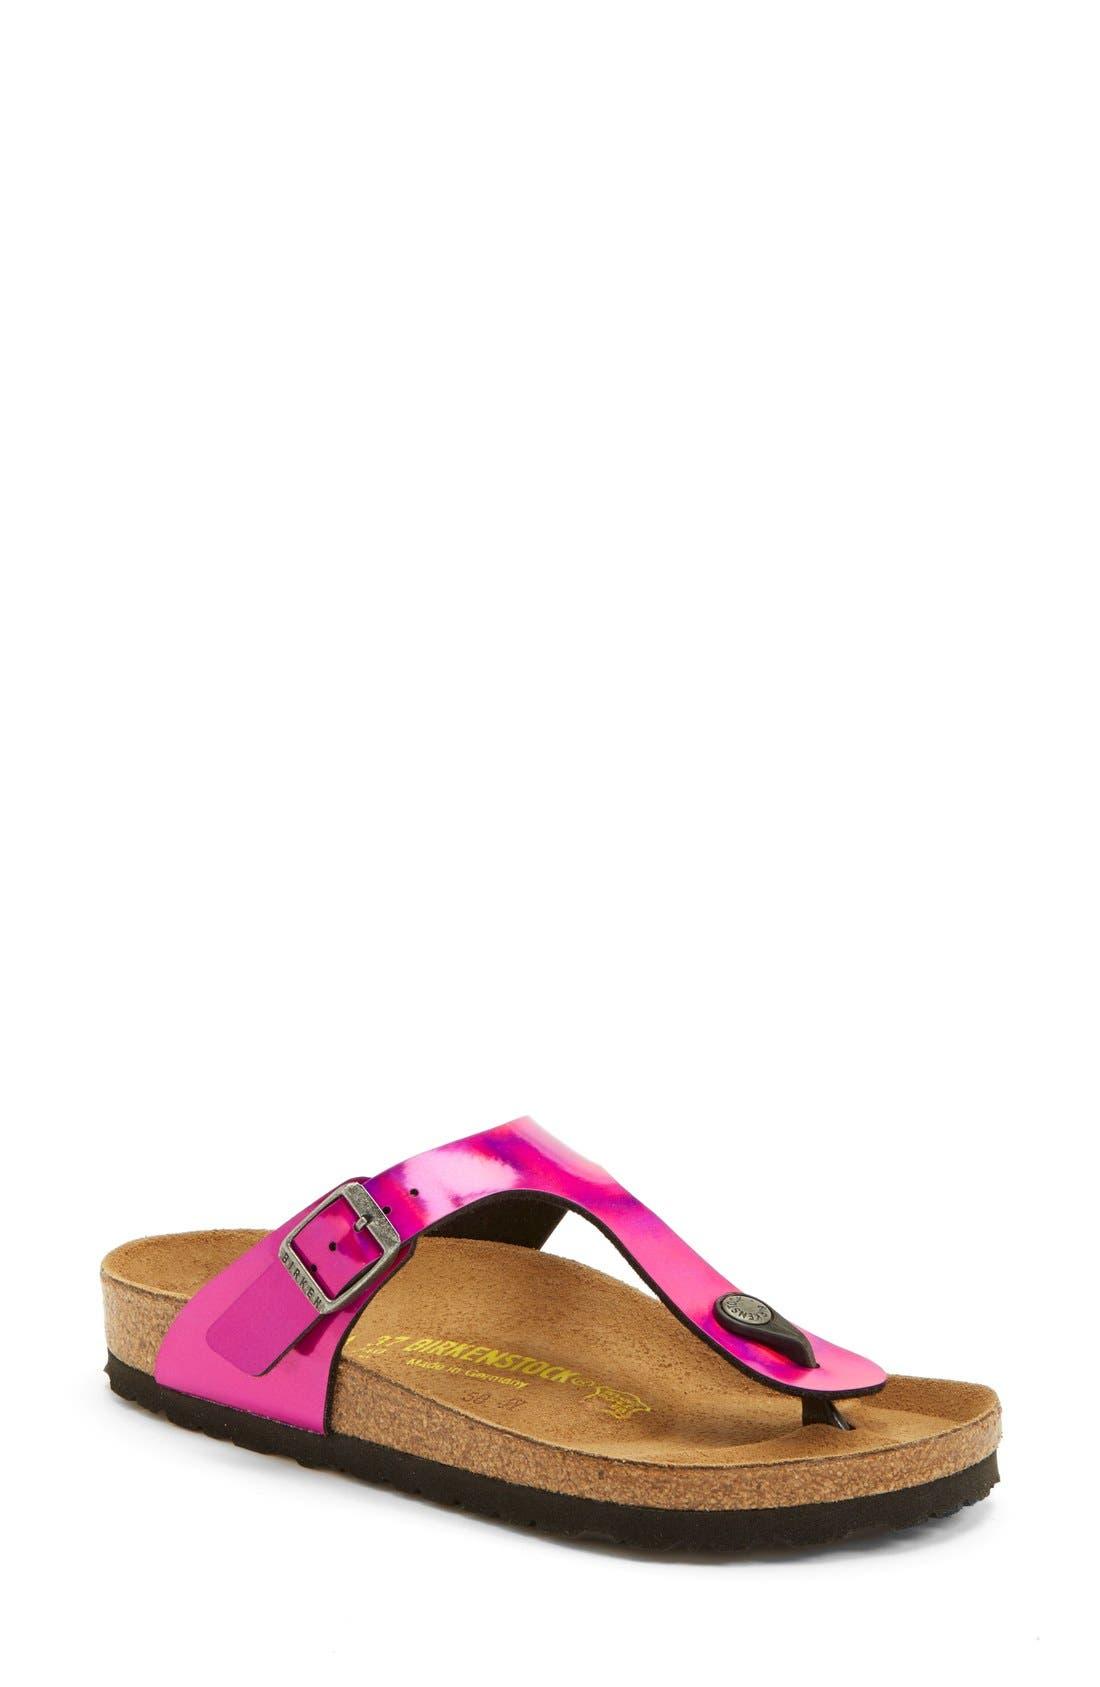 'Gizeh' Thong Sandal,                         Main,                         color, Pink